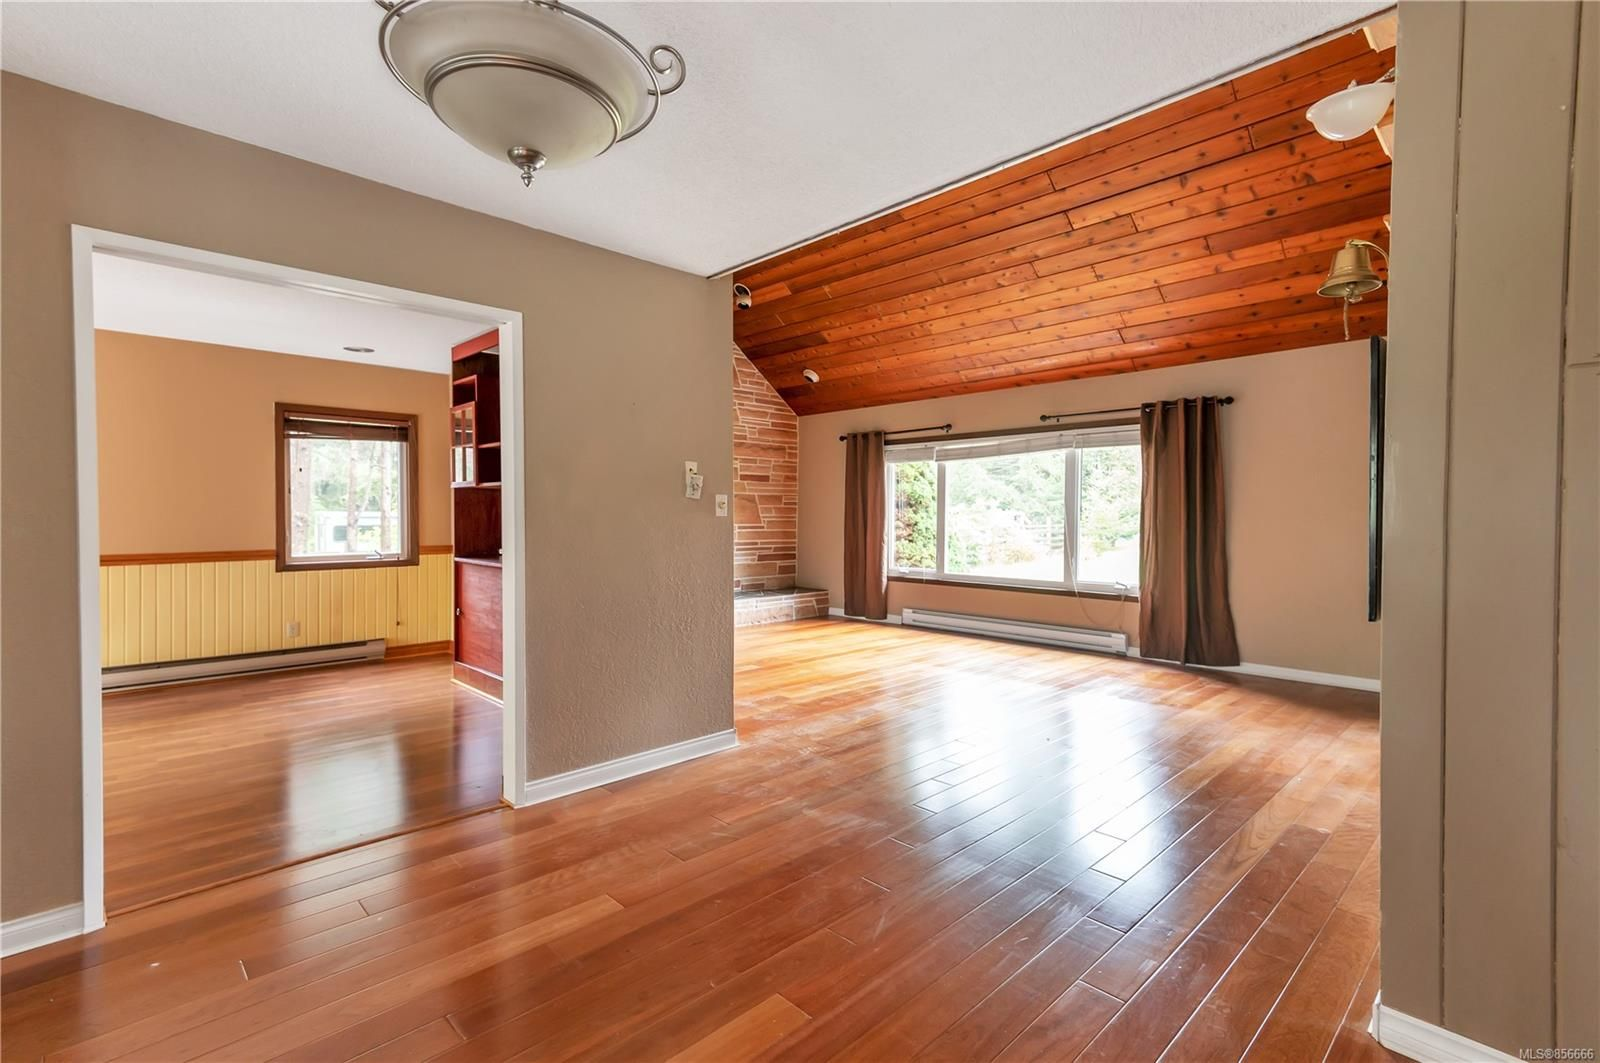 Photo 17: Photos: 2468 Oakes Rd in : CV Merville Black Creek House for sale (Comox Valley)  : MLS®# 856666